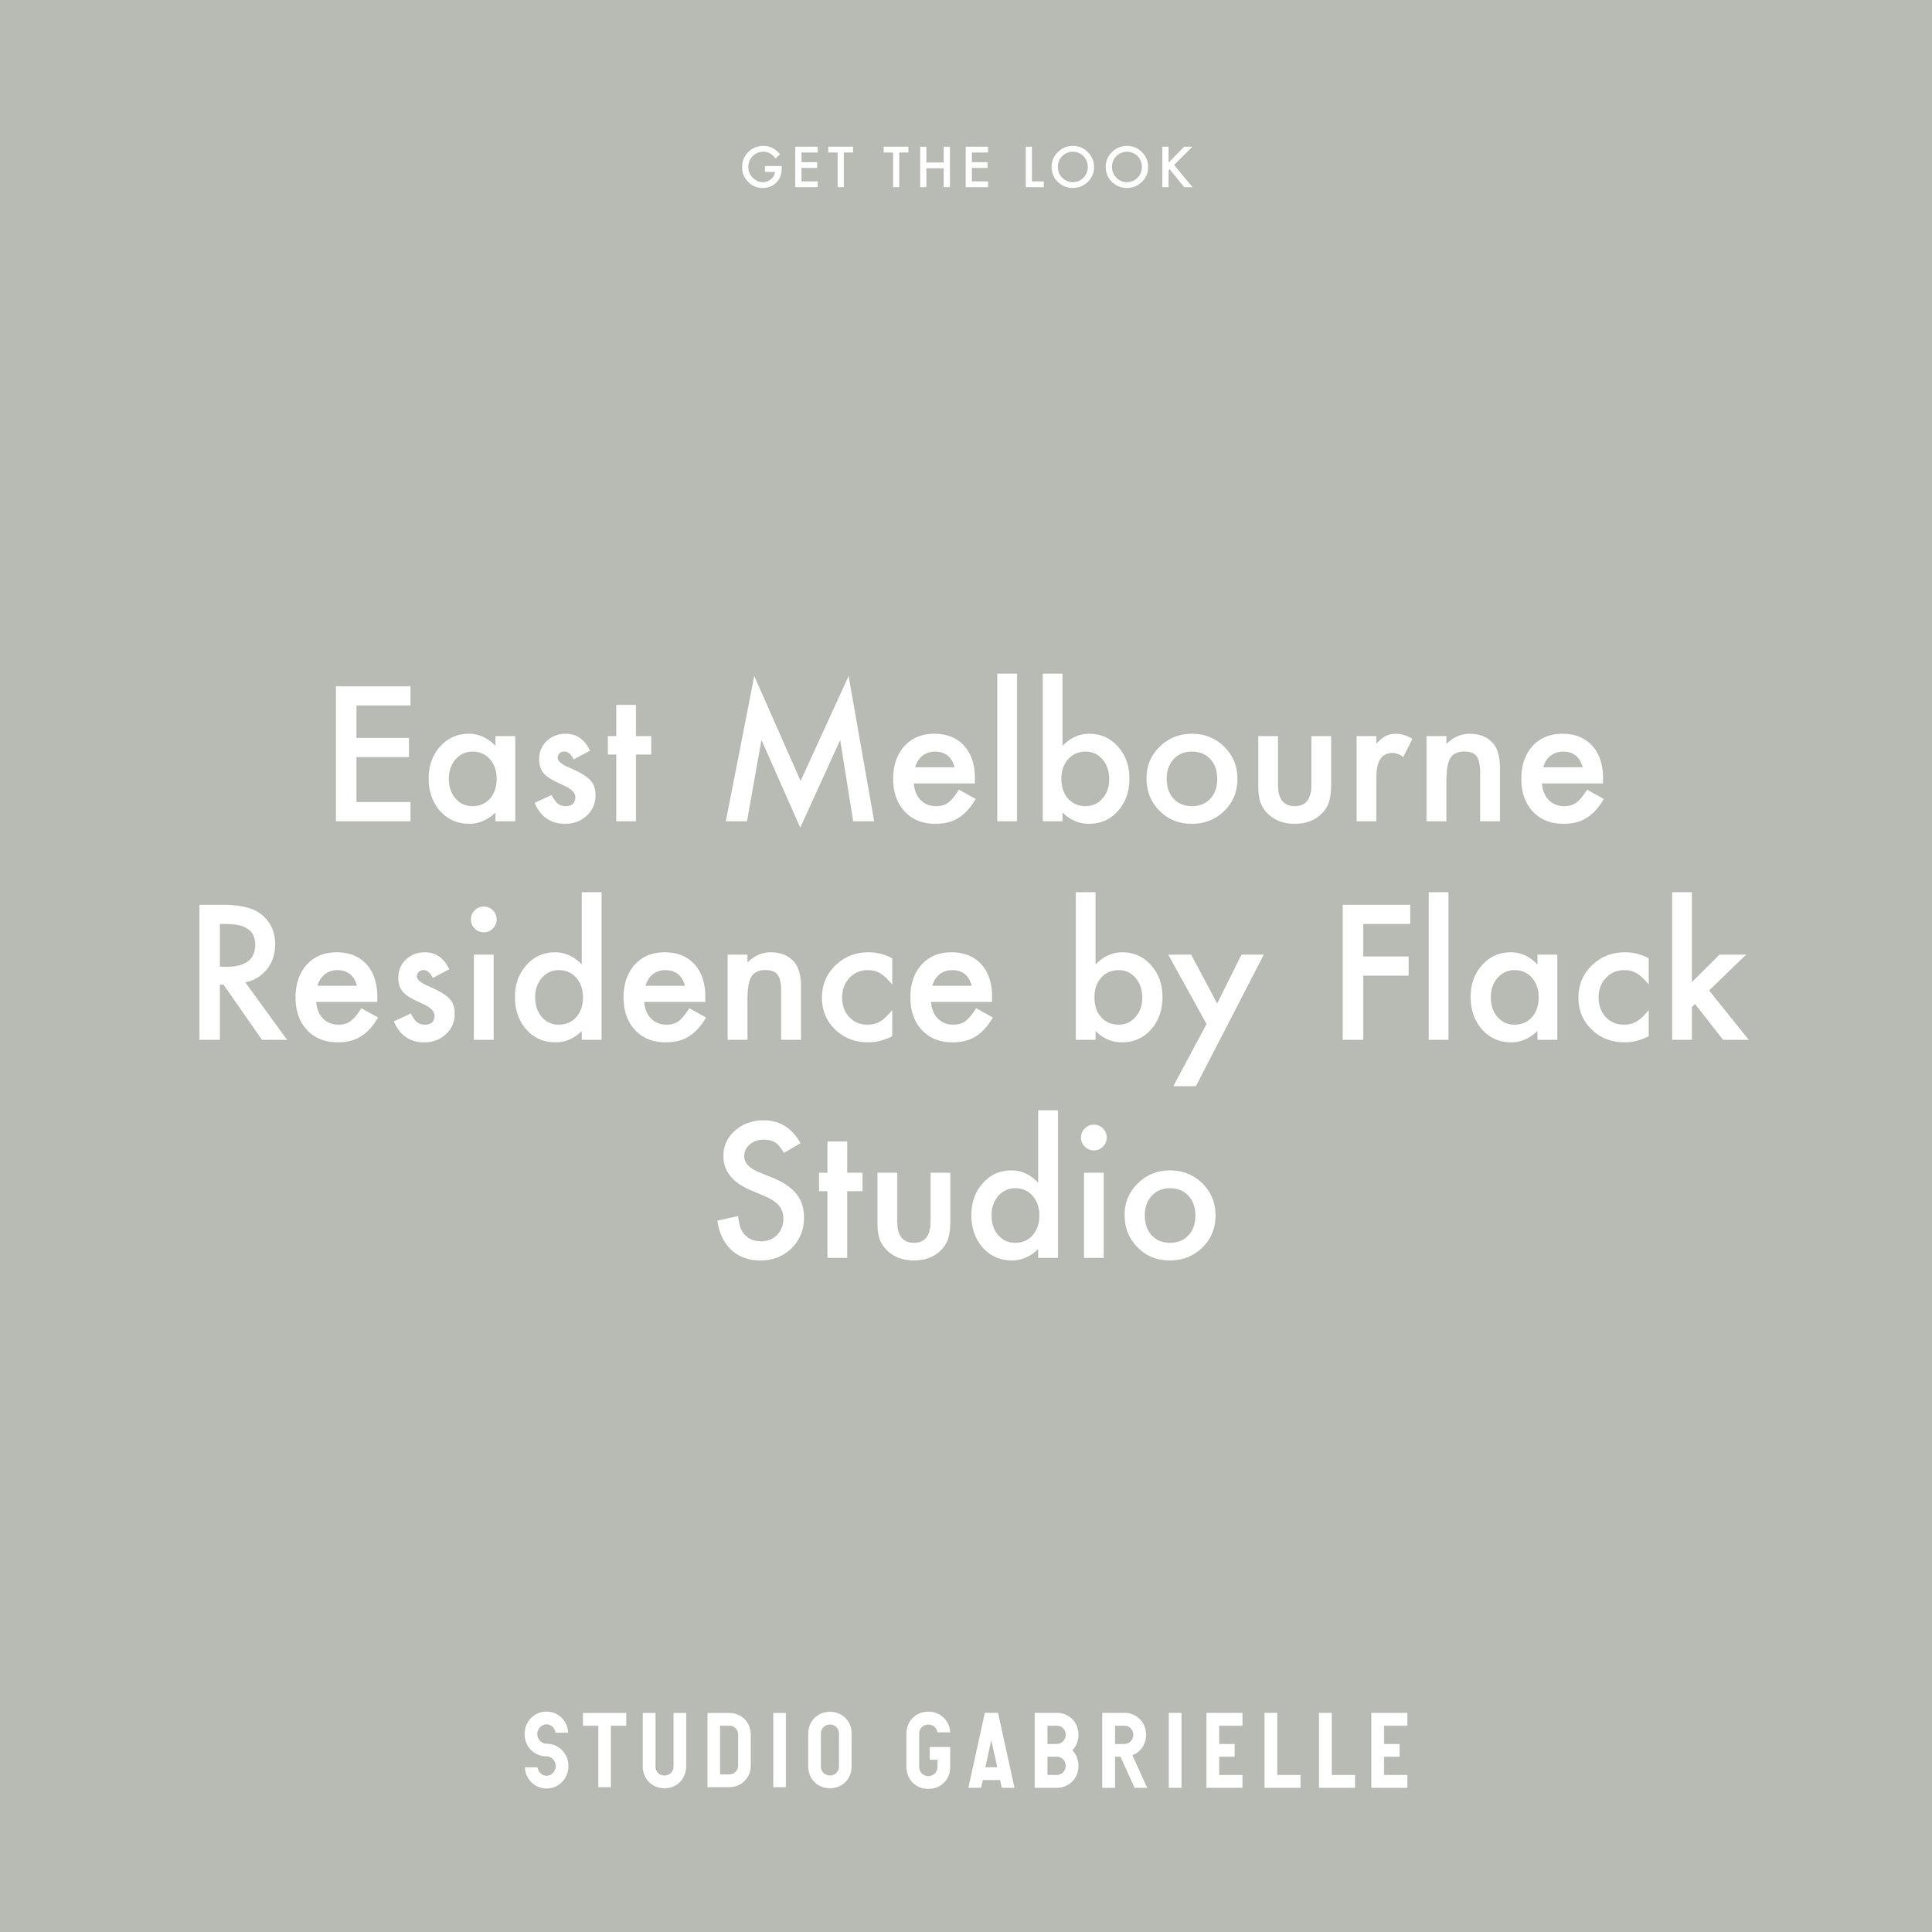 StudioGabrielle-GetTheLook-East-Melbourne-Residence-FlackStudio-studiogabrielle.co.uk